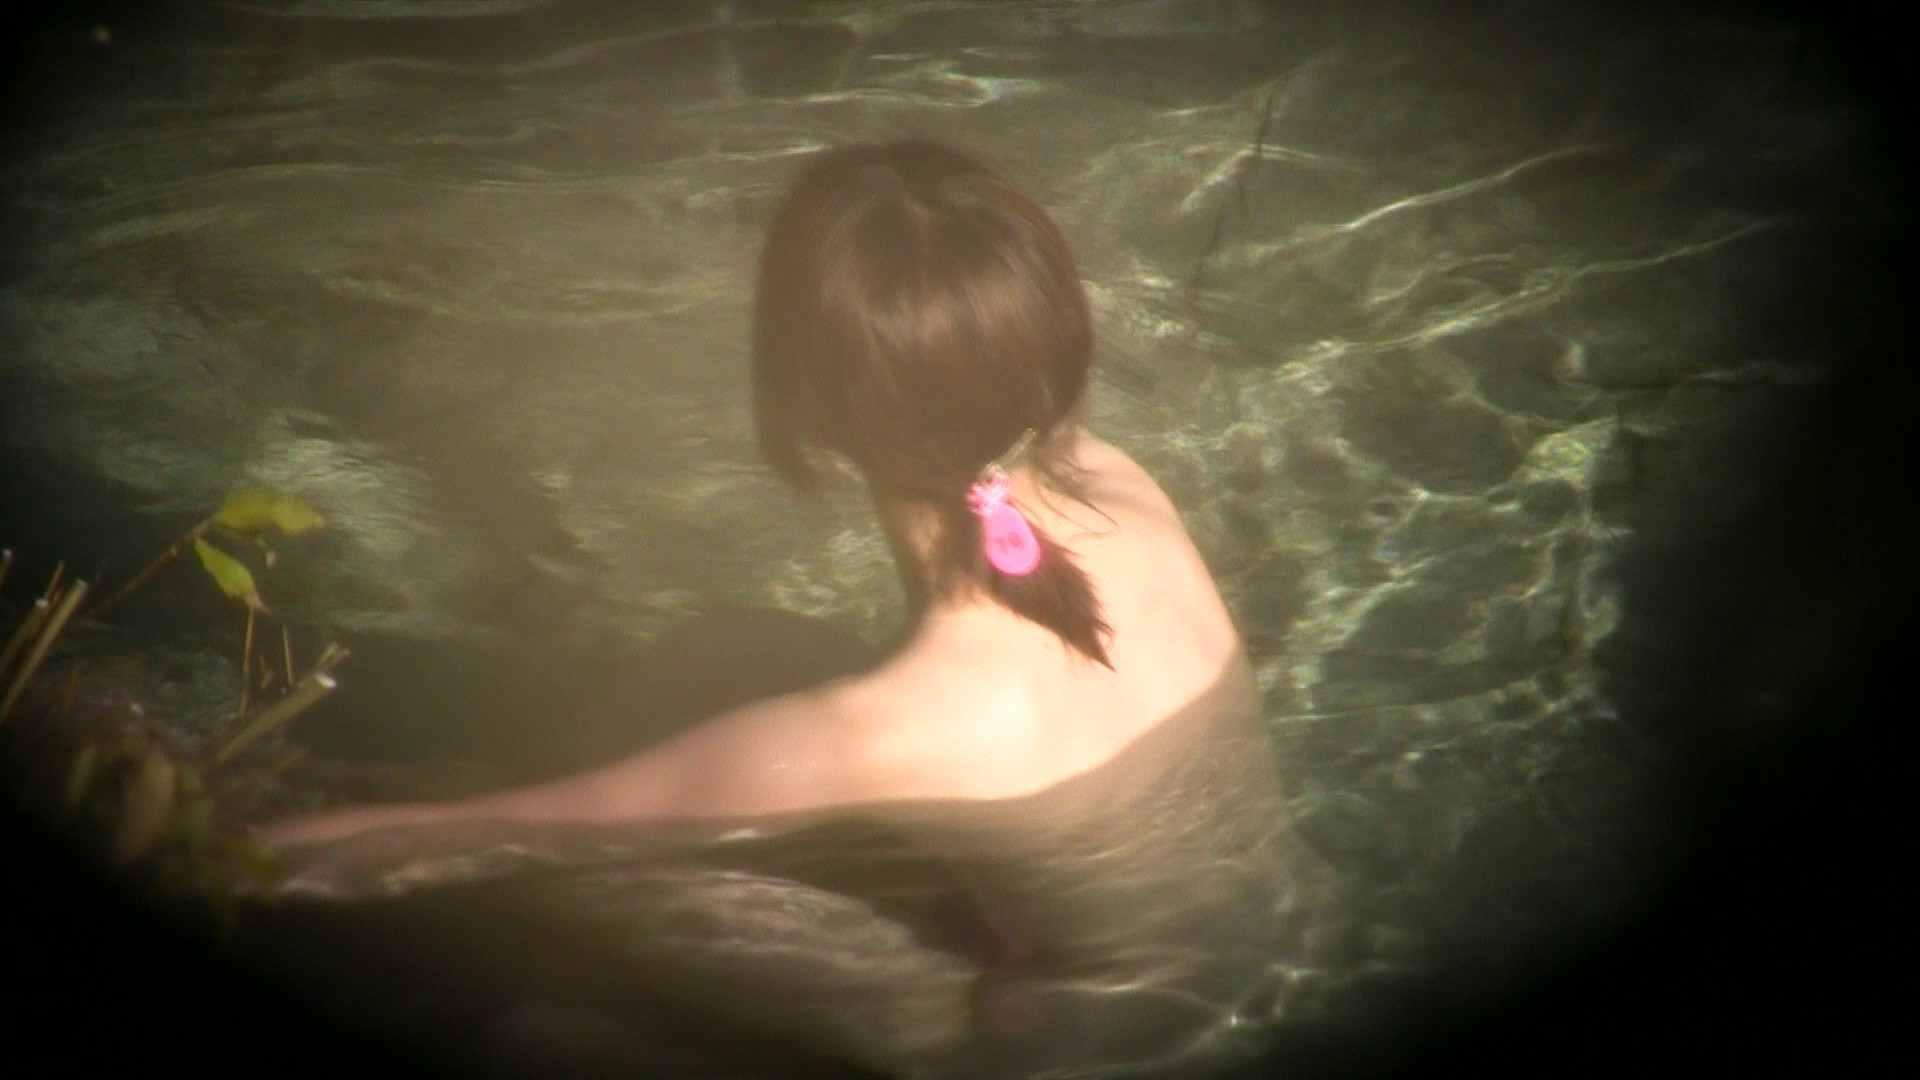 Aquaな露天風呂Vol.698 盗撮 | HなOL  86pic 46